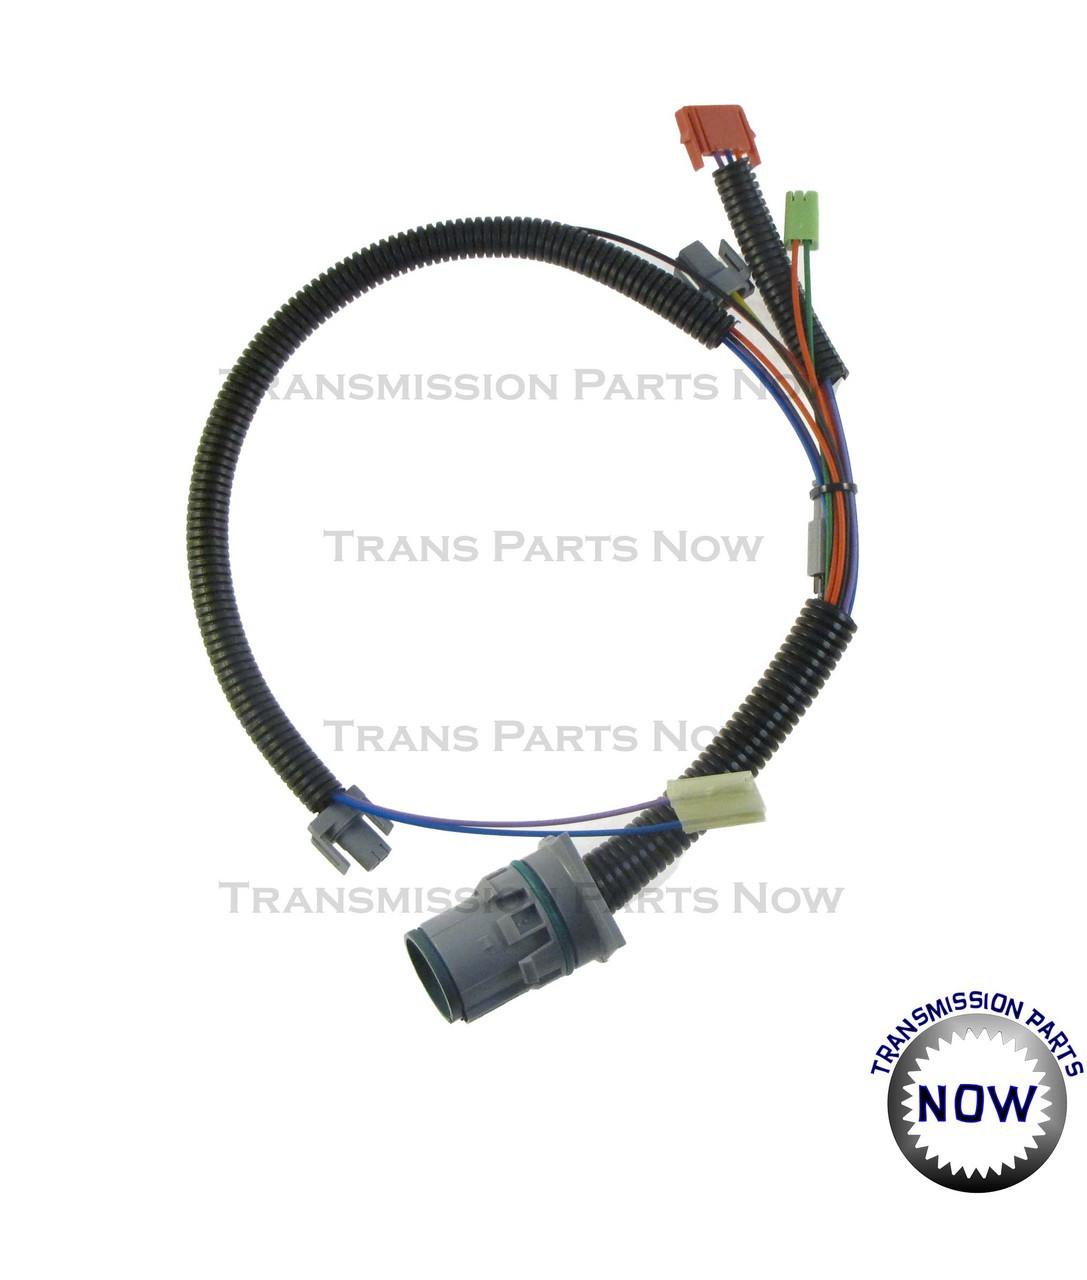 Internal Wiring Harness 4L80E 1993-2003 34446 on